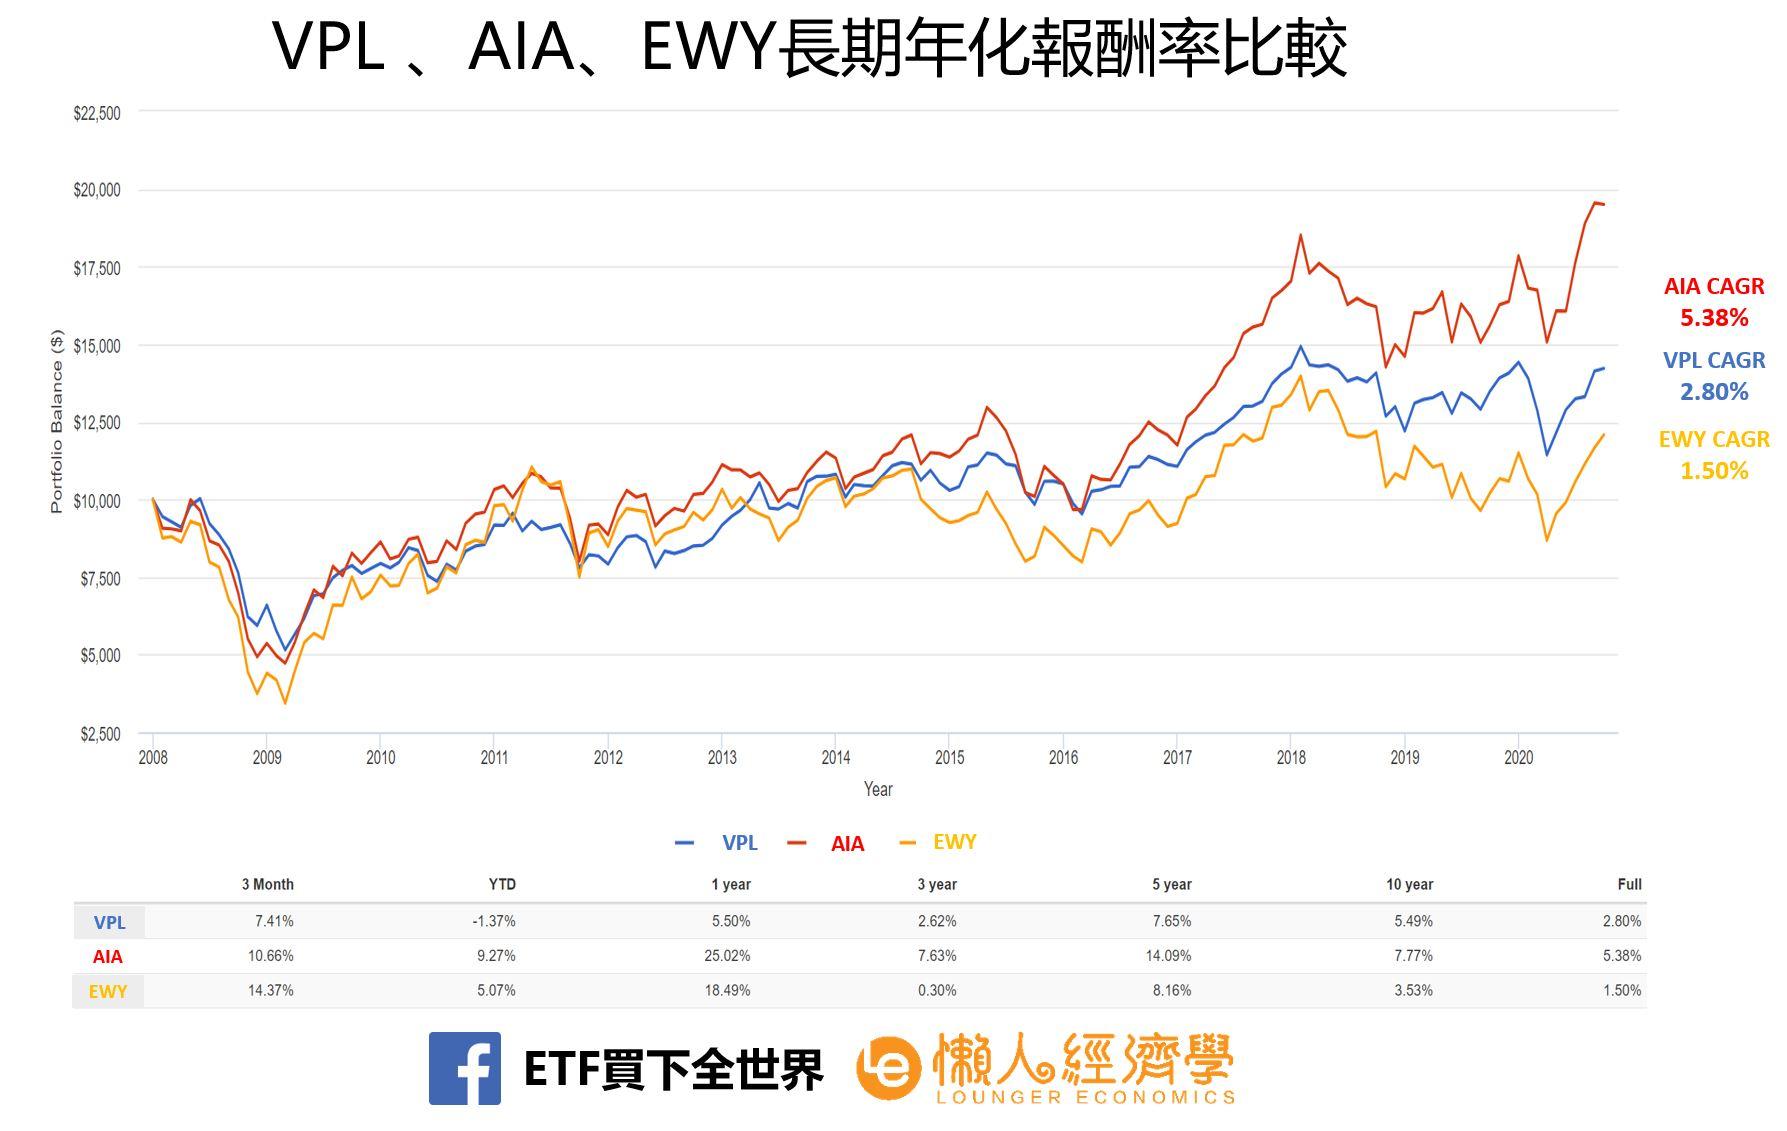 VPL、AIA及EWY 長期年化報酬率比較